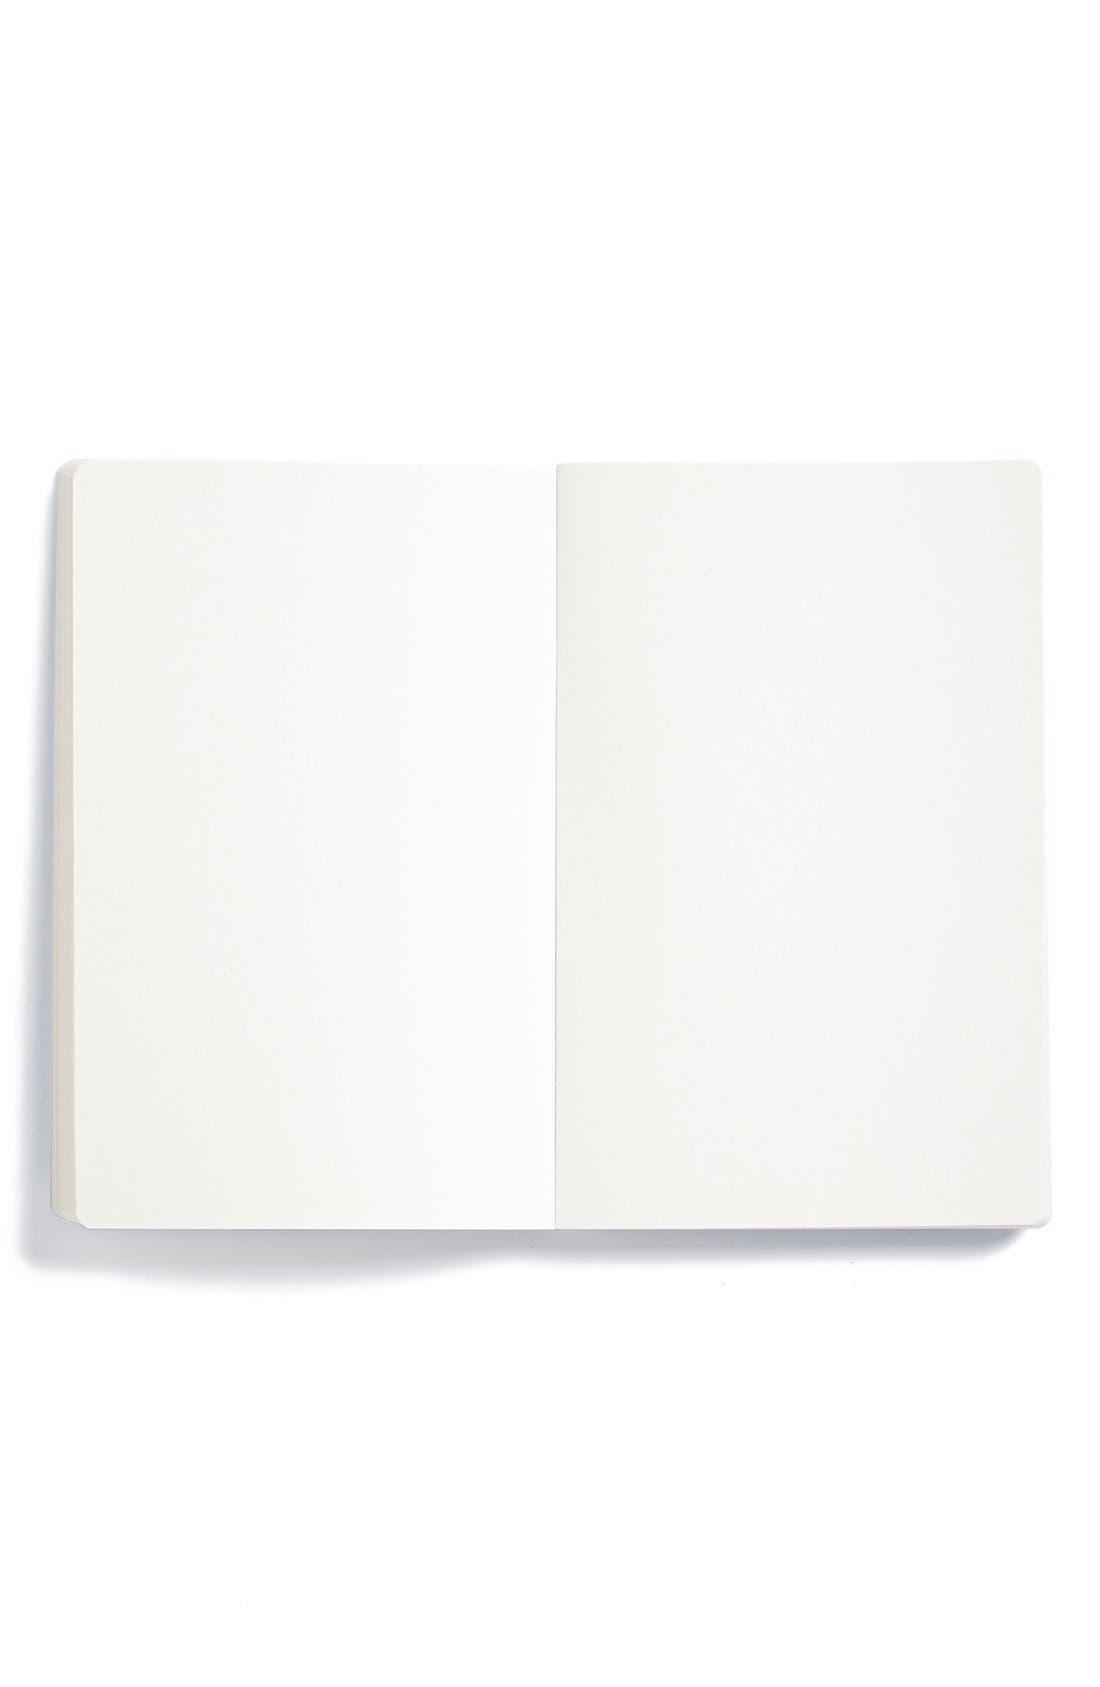 Alternate Image 2  - Poketo 'One Day' Small Notebook